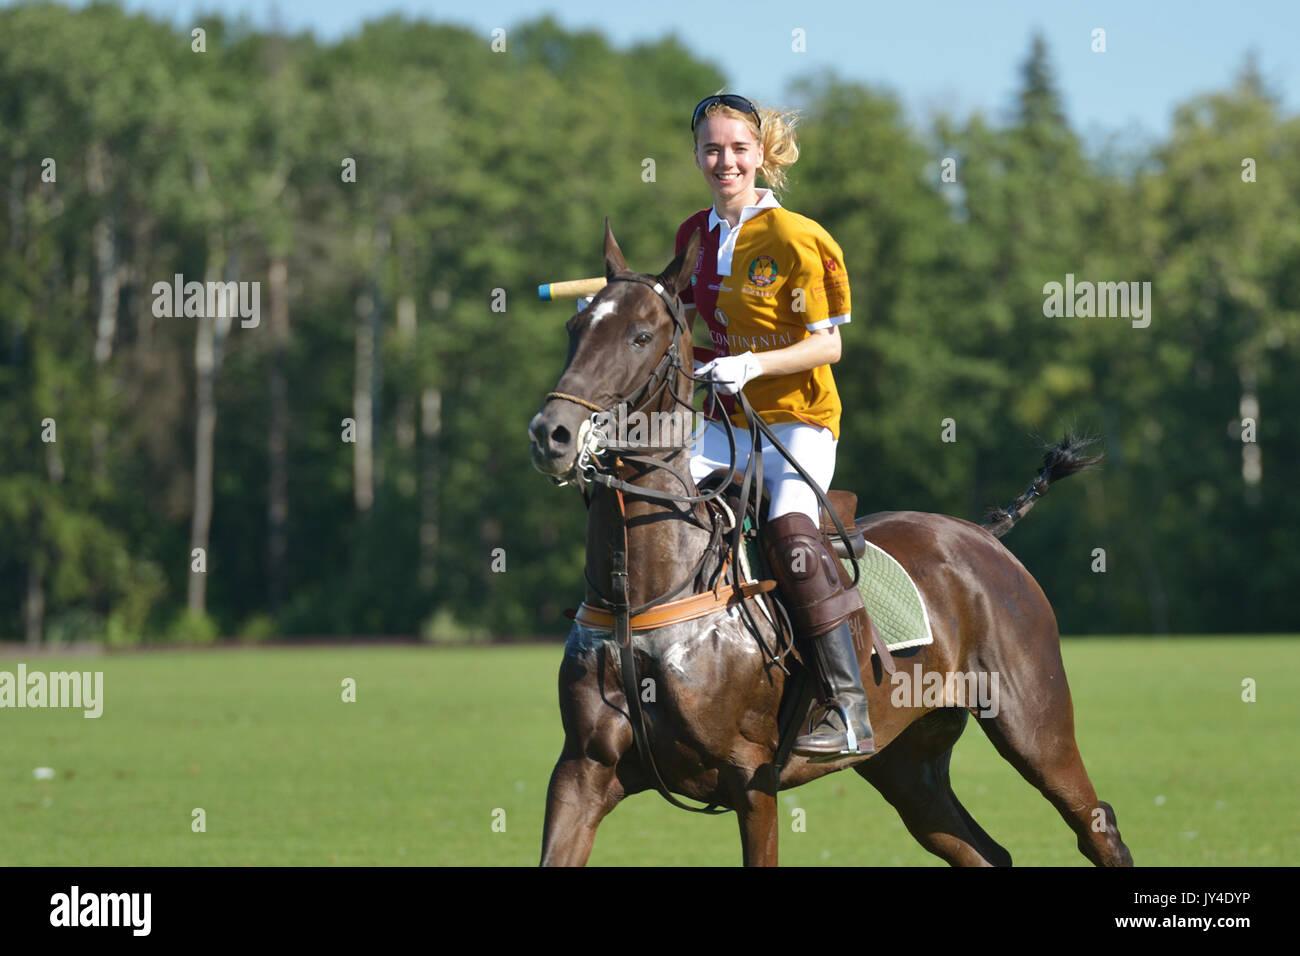 Tseleevo, Moscow region, Russia - July 26, 2014: Aliona Chekhova of Tseleevo Polo club after the match against the Oxbridge polo team during the Briti - Stock Image